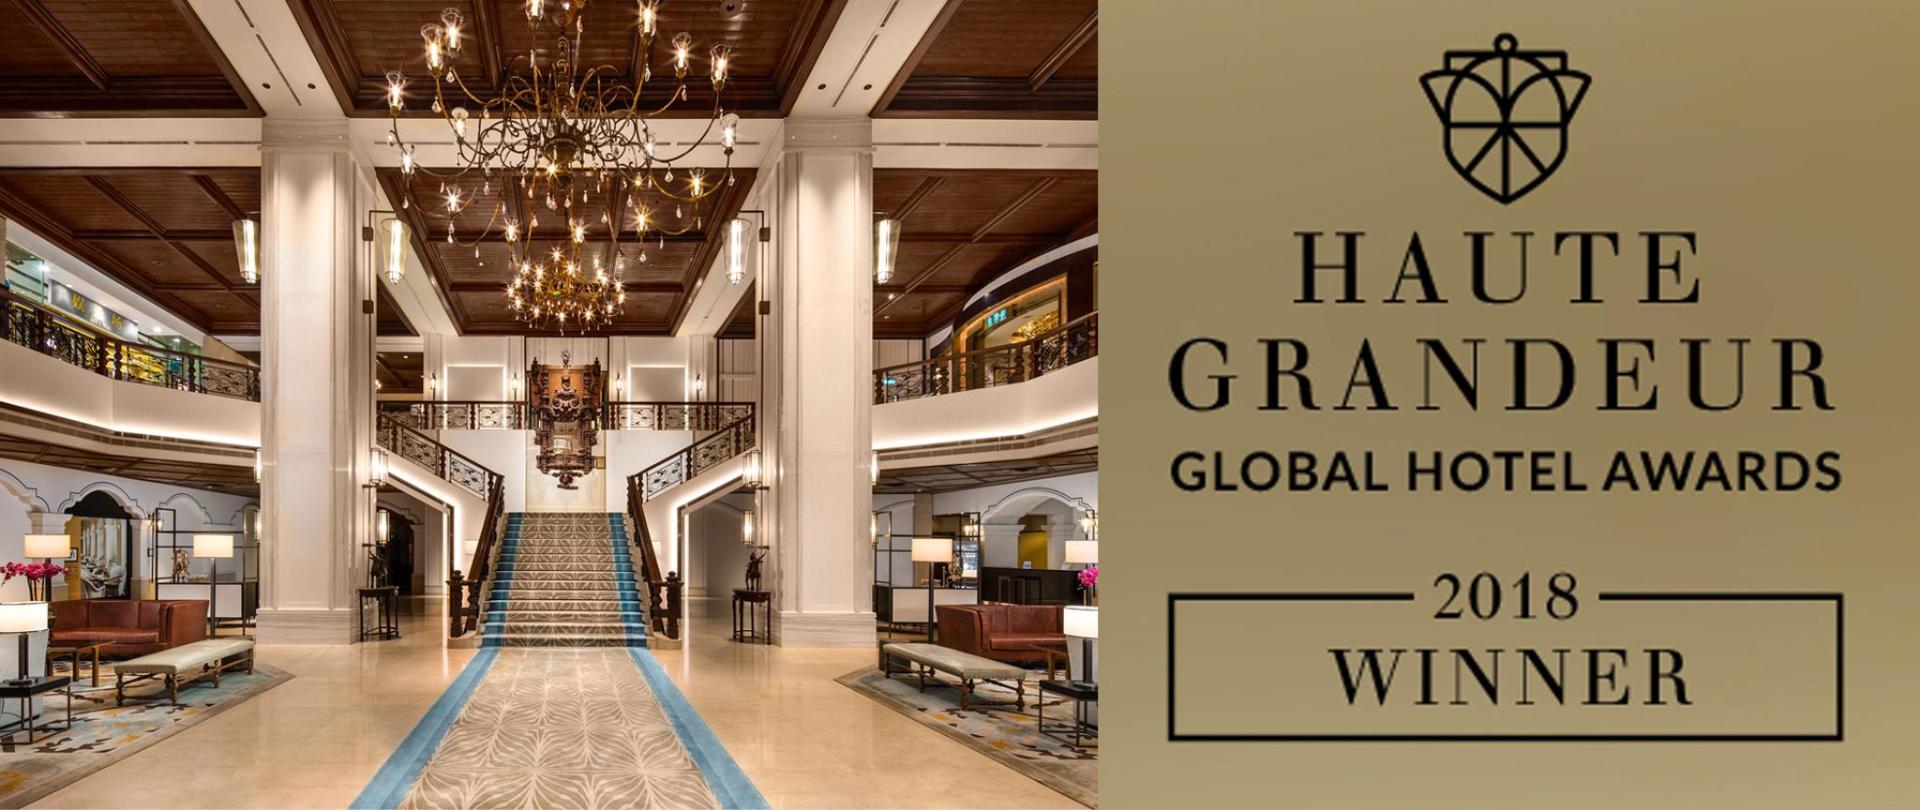 HG Award-banner copy.jpg